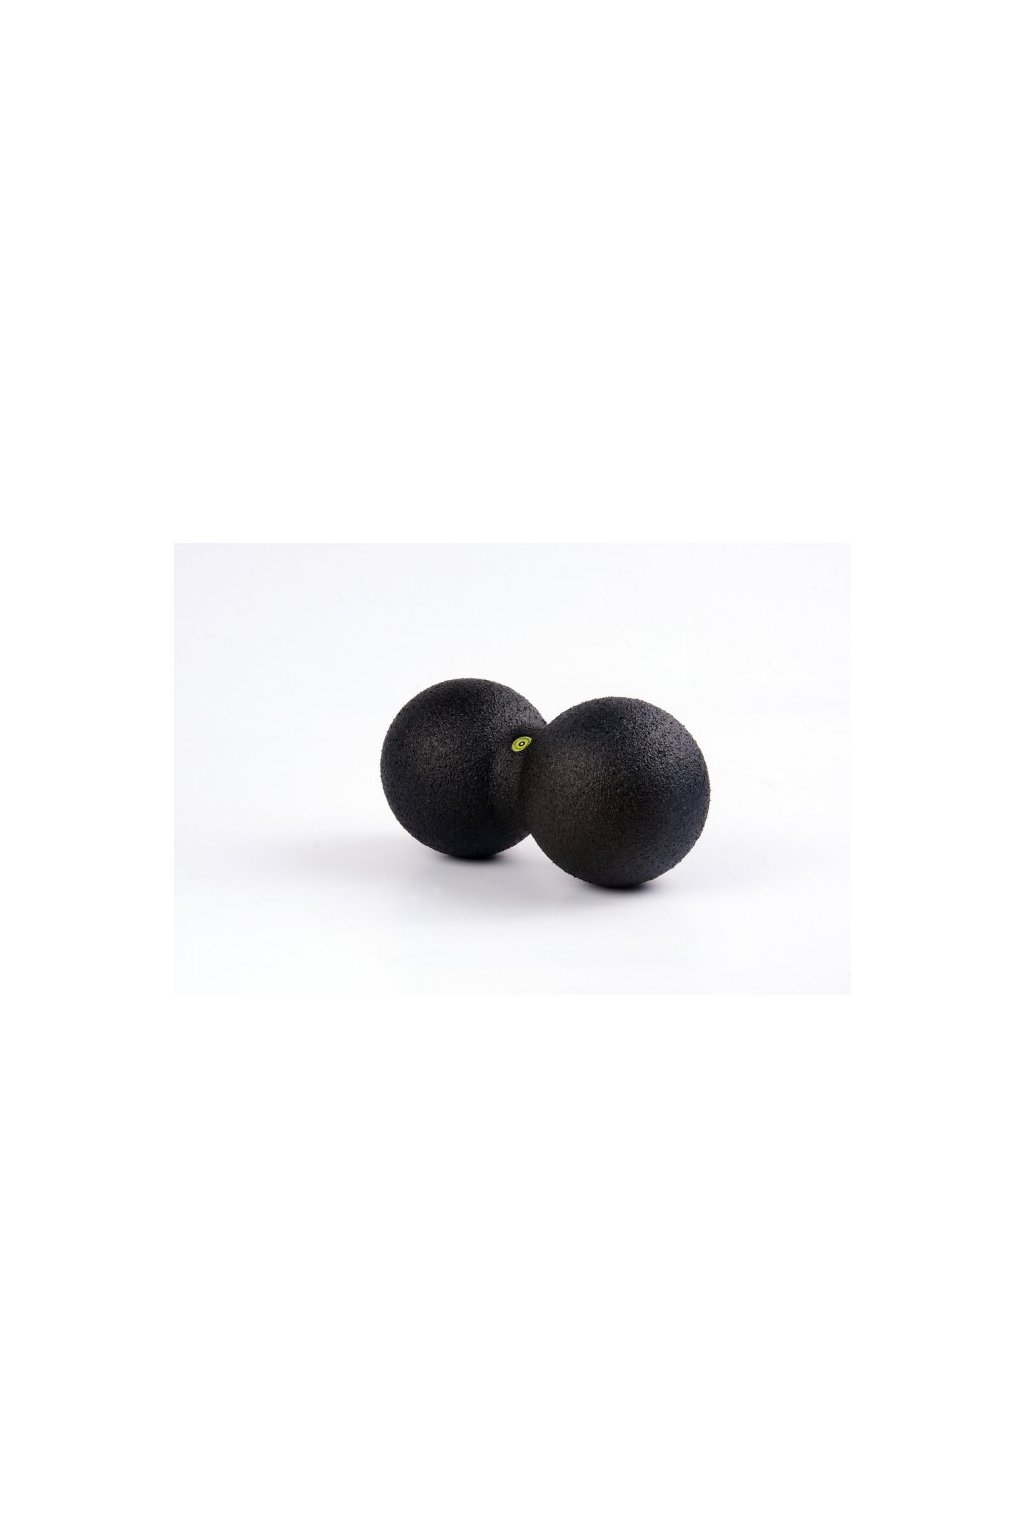 407 masazni koule blackroll duoball(1)